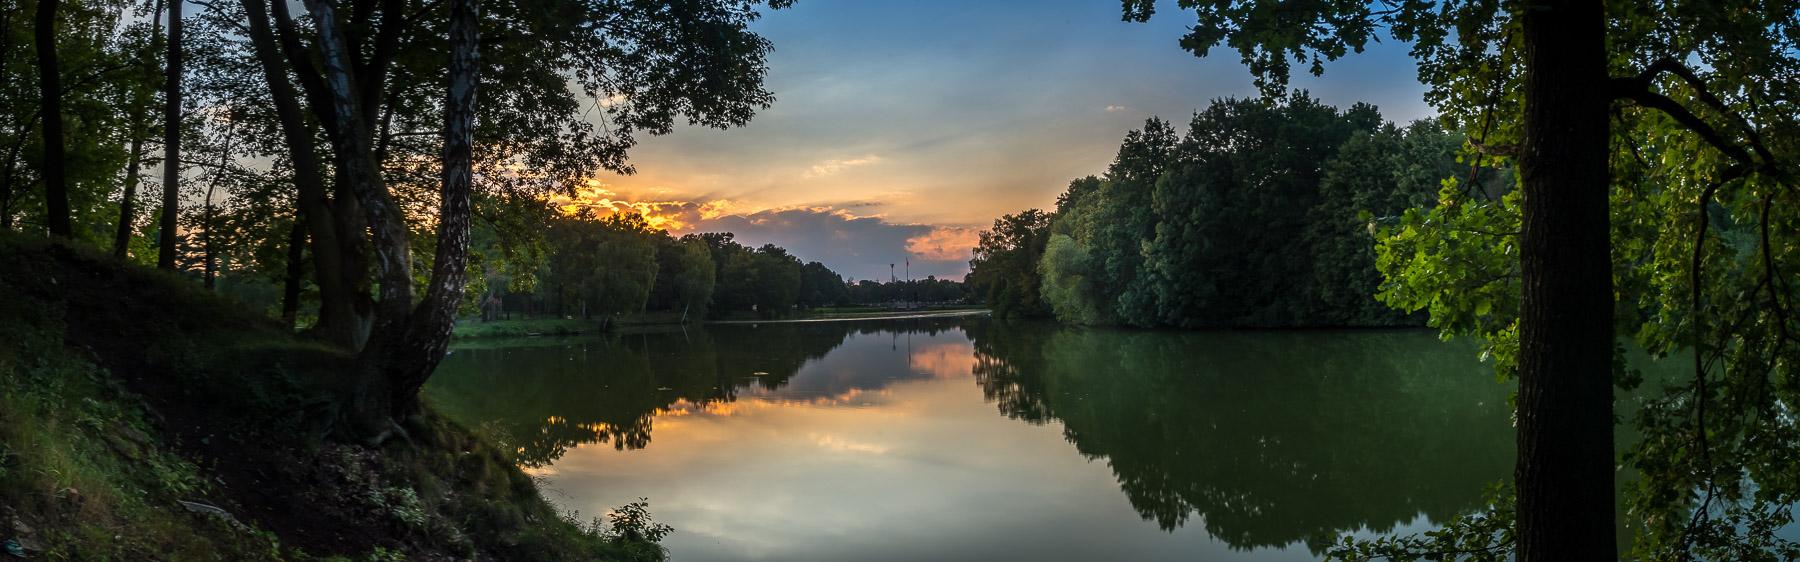 Park w Świerklańcu - panorama